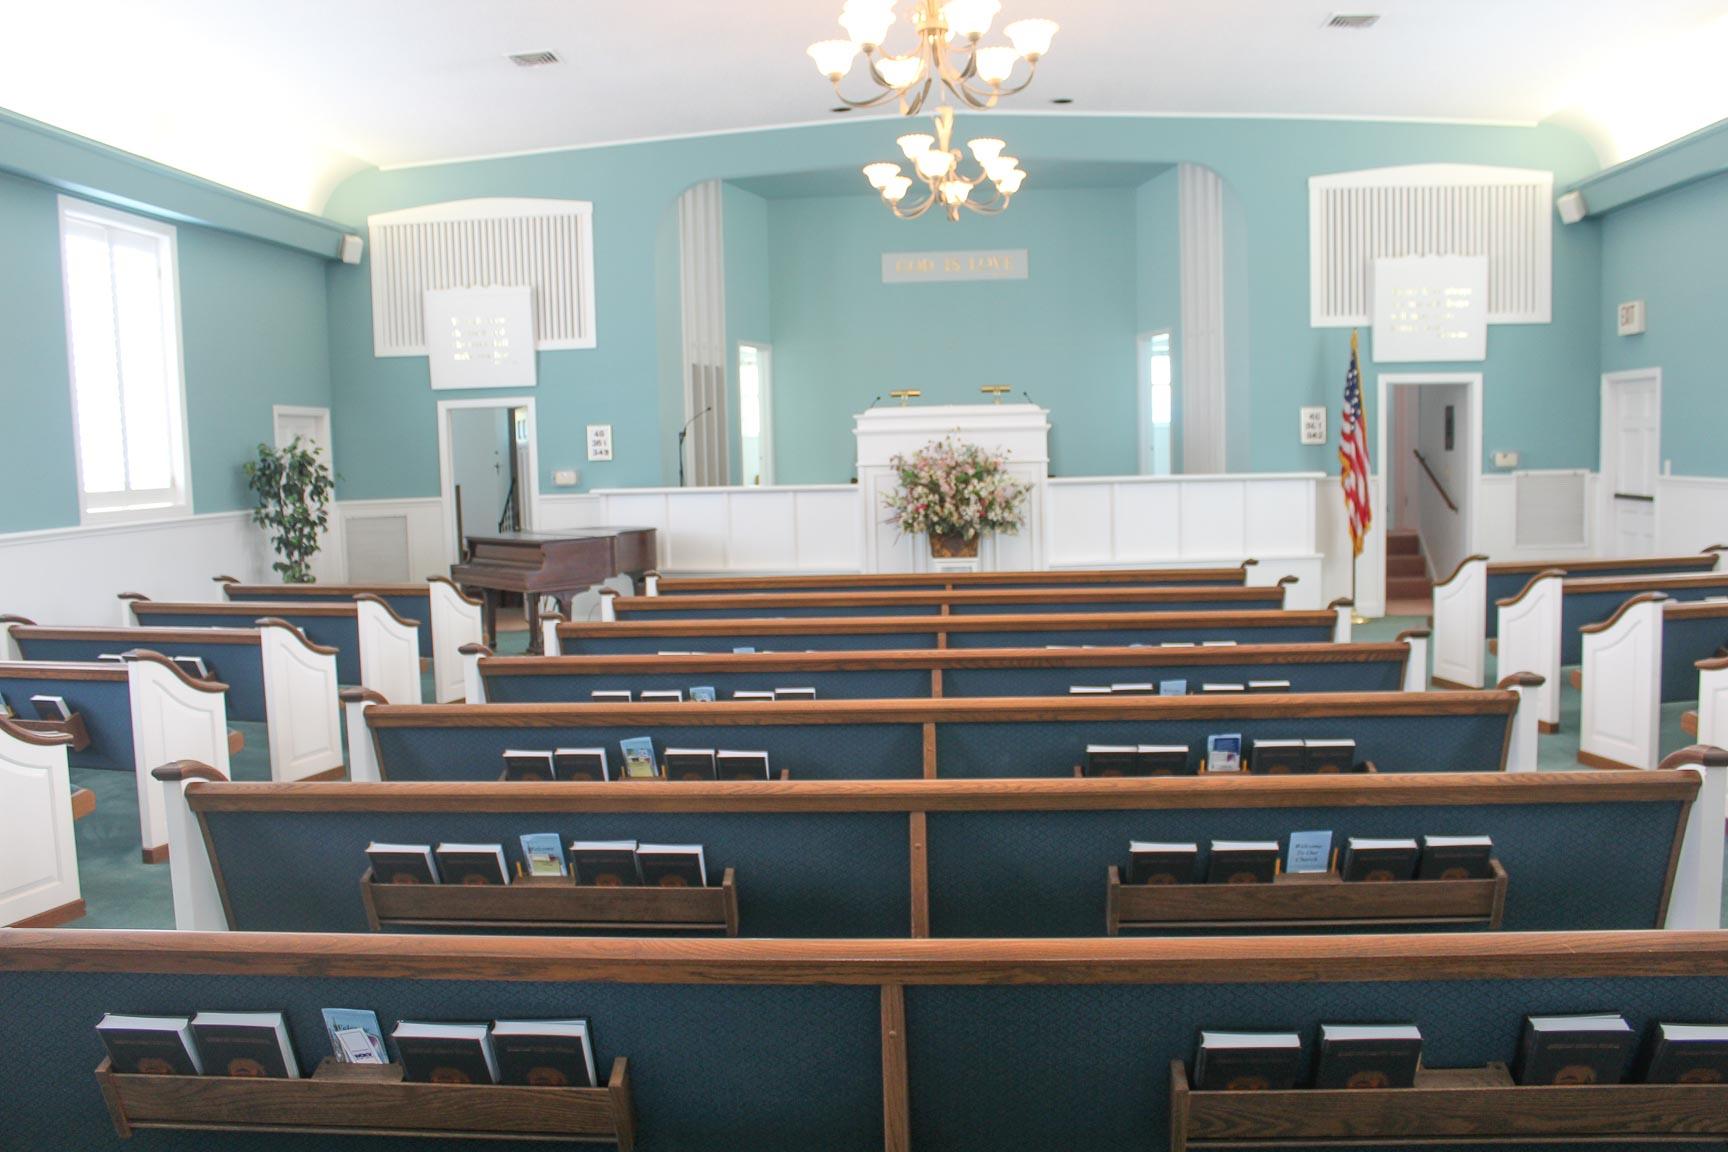 jax-church-18.jpg